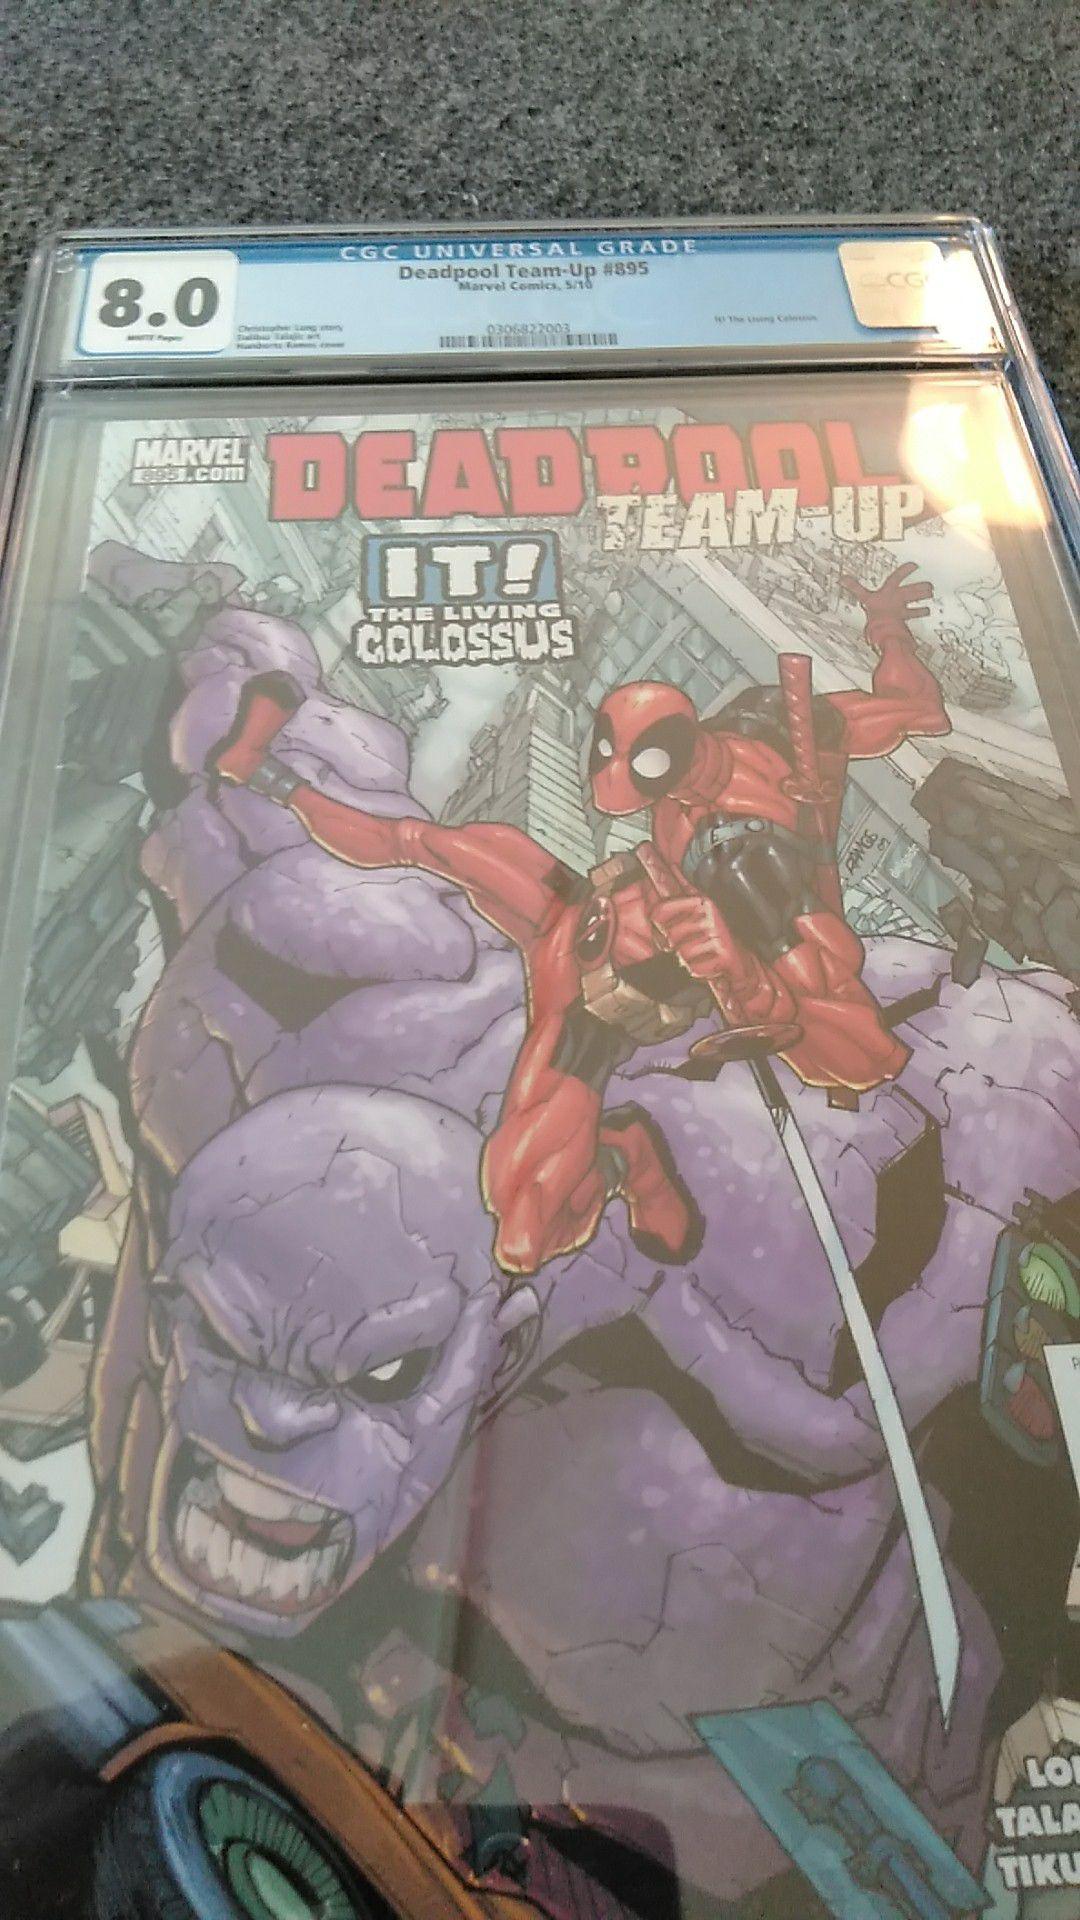 Deadpool Team-Up #895 CGC 8.0